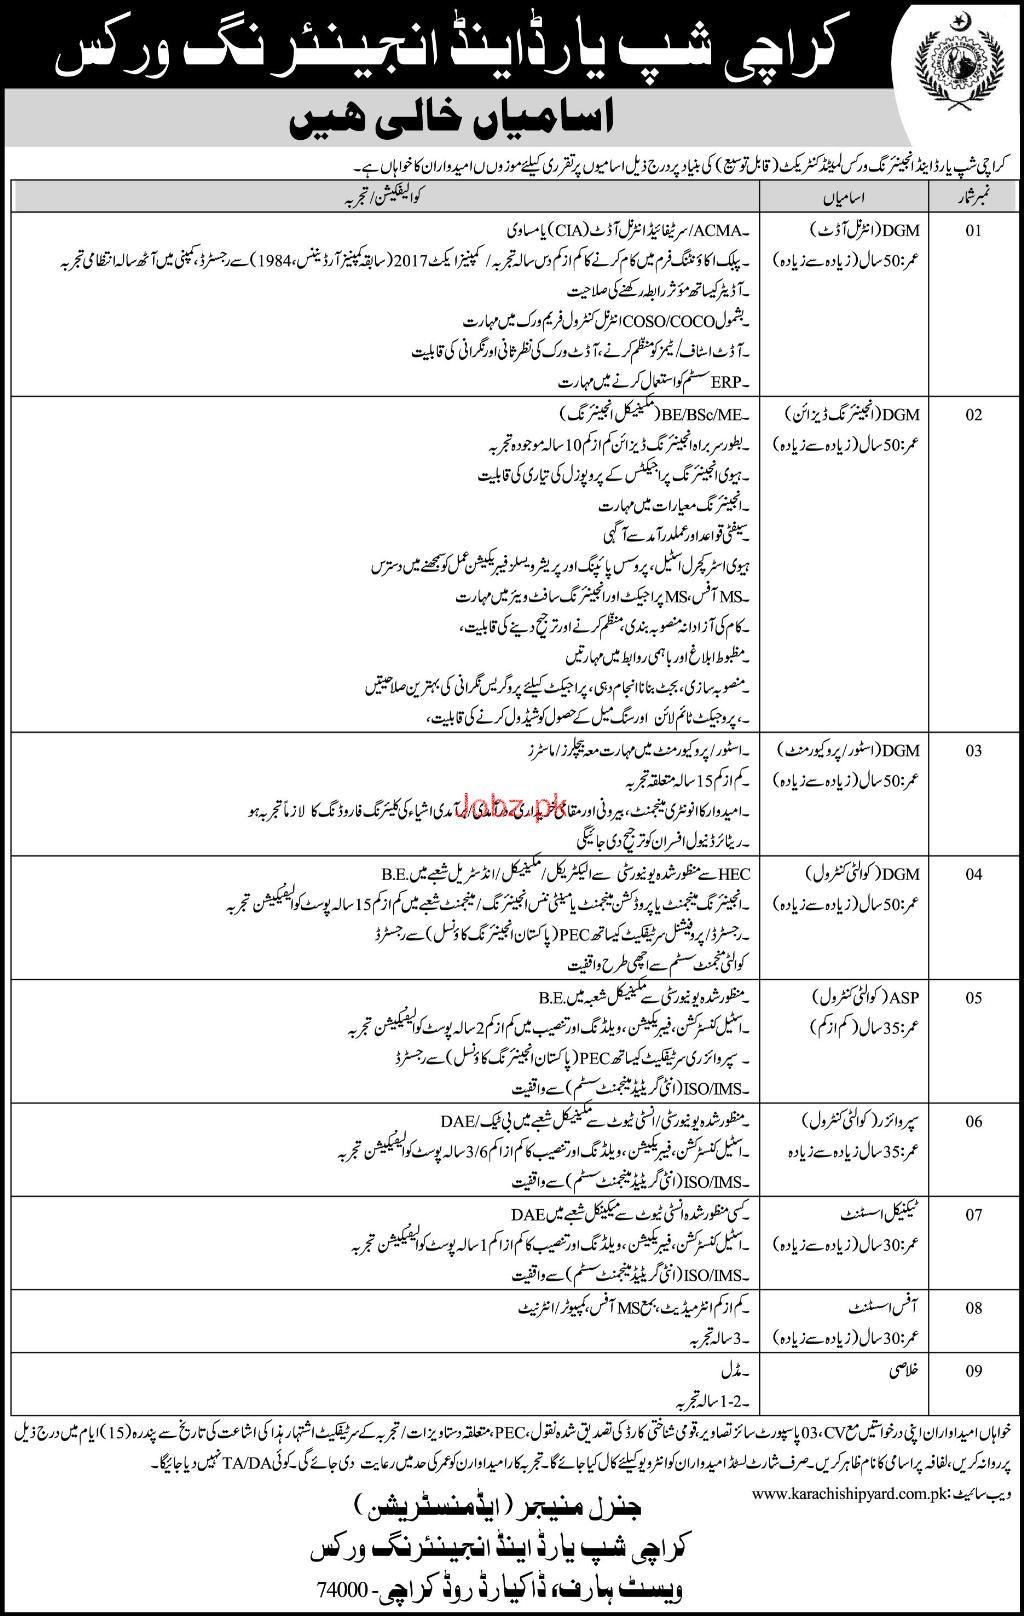 Karachi Shipyard and Engineering Works Limited Jobs